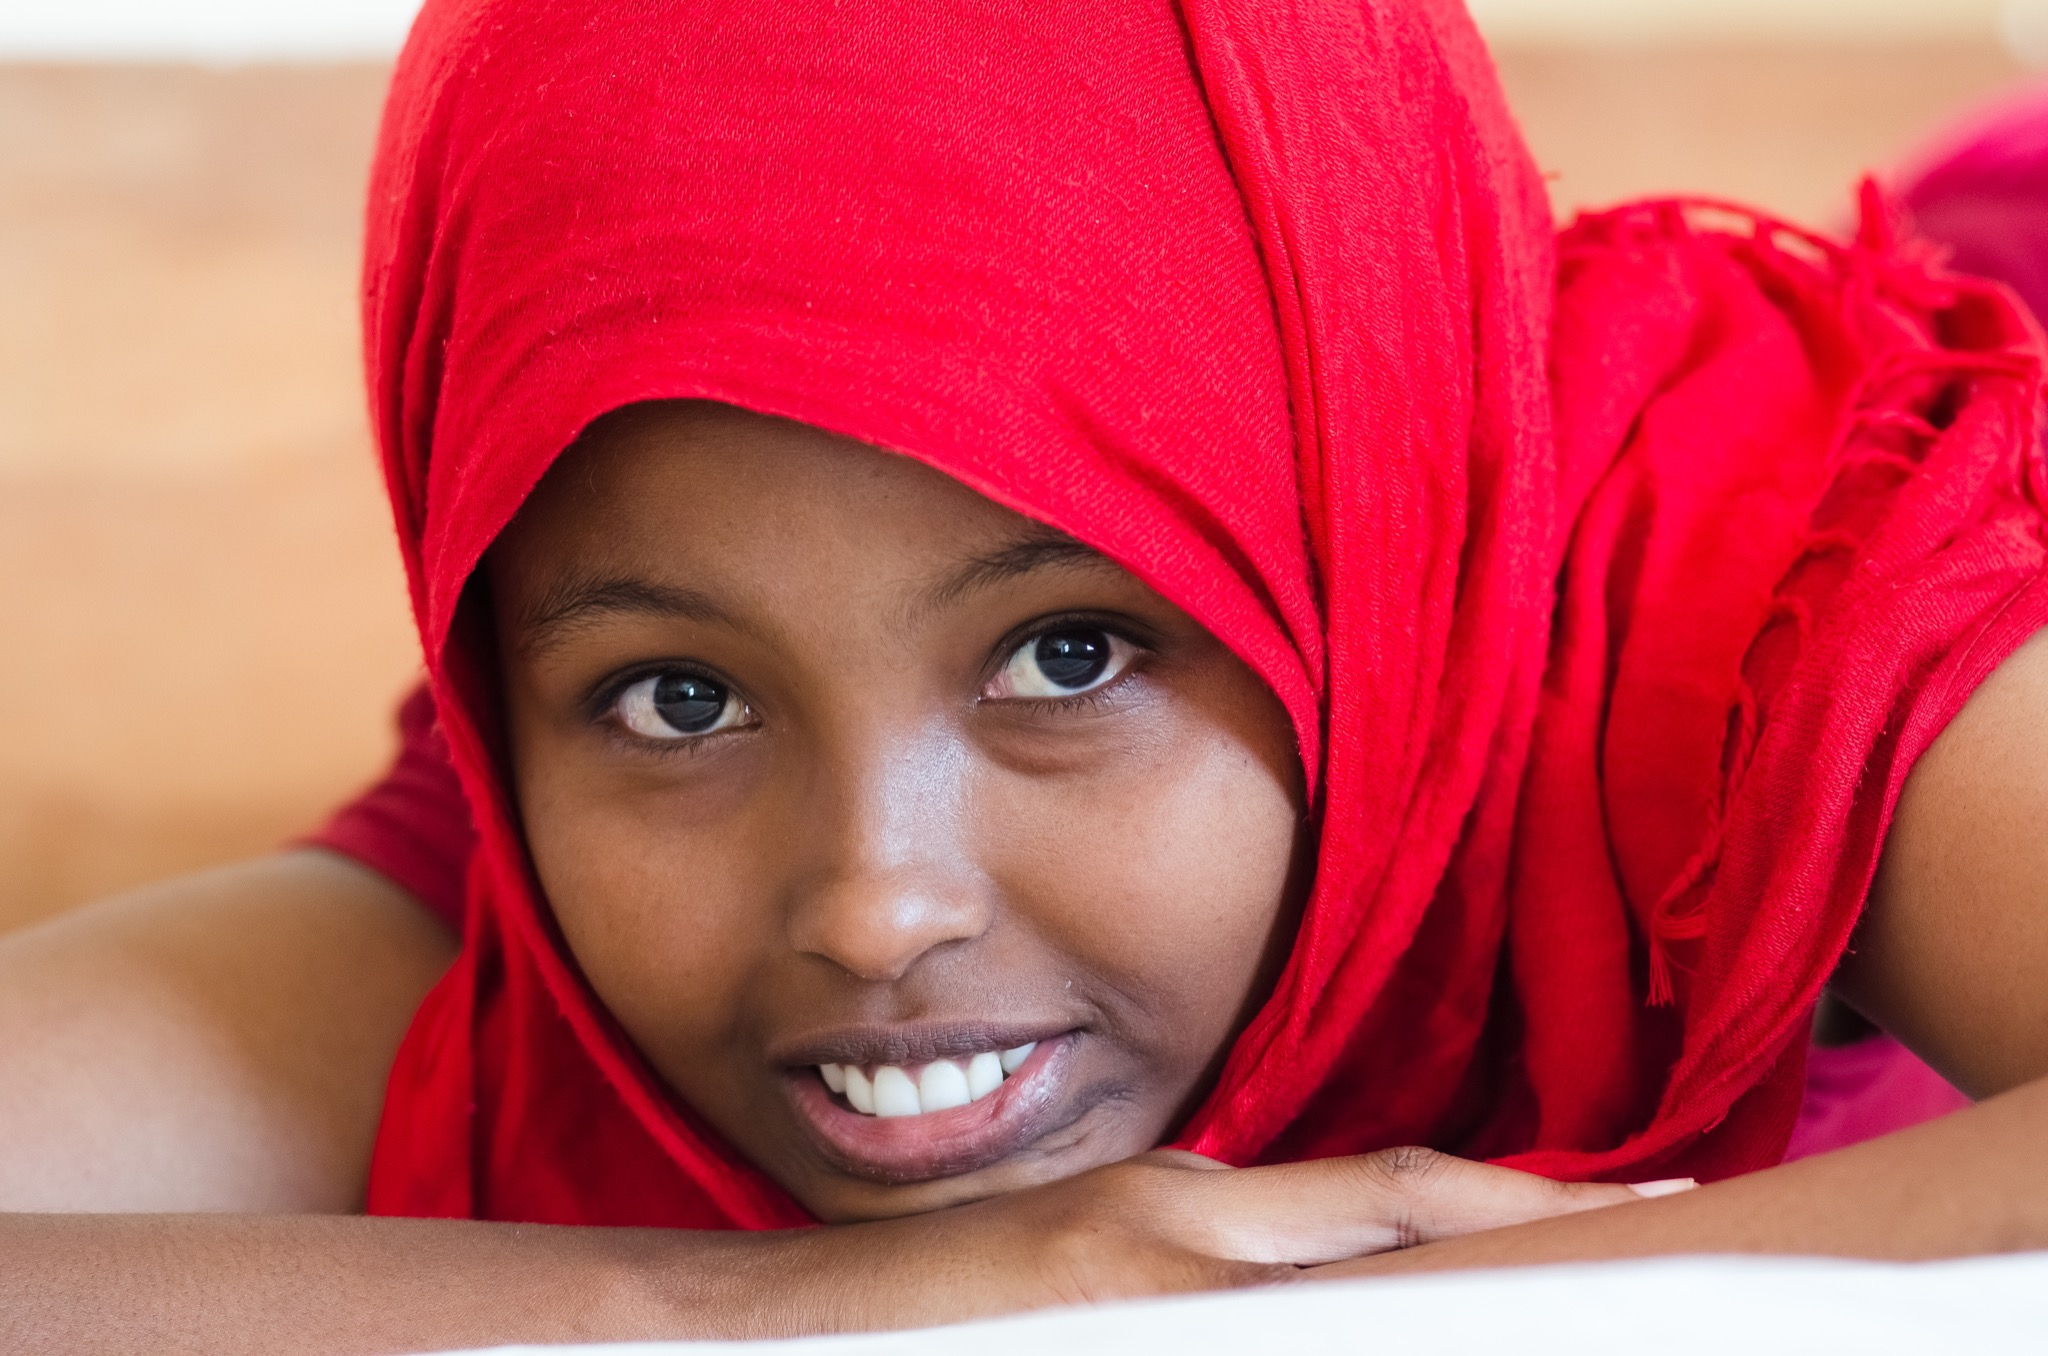 immigranti_somalia_ahmar_helwa_hal_far